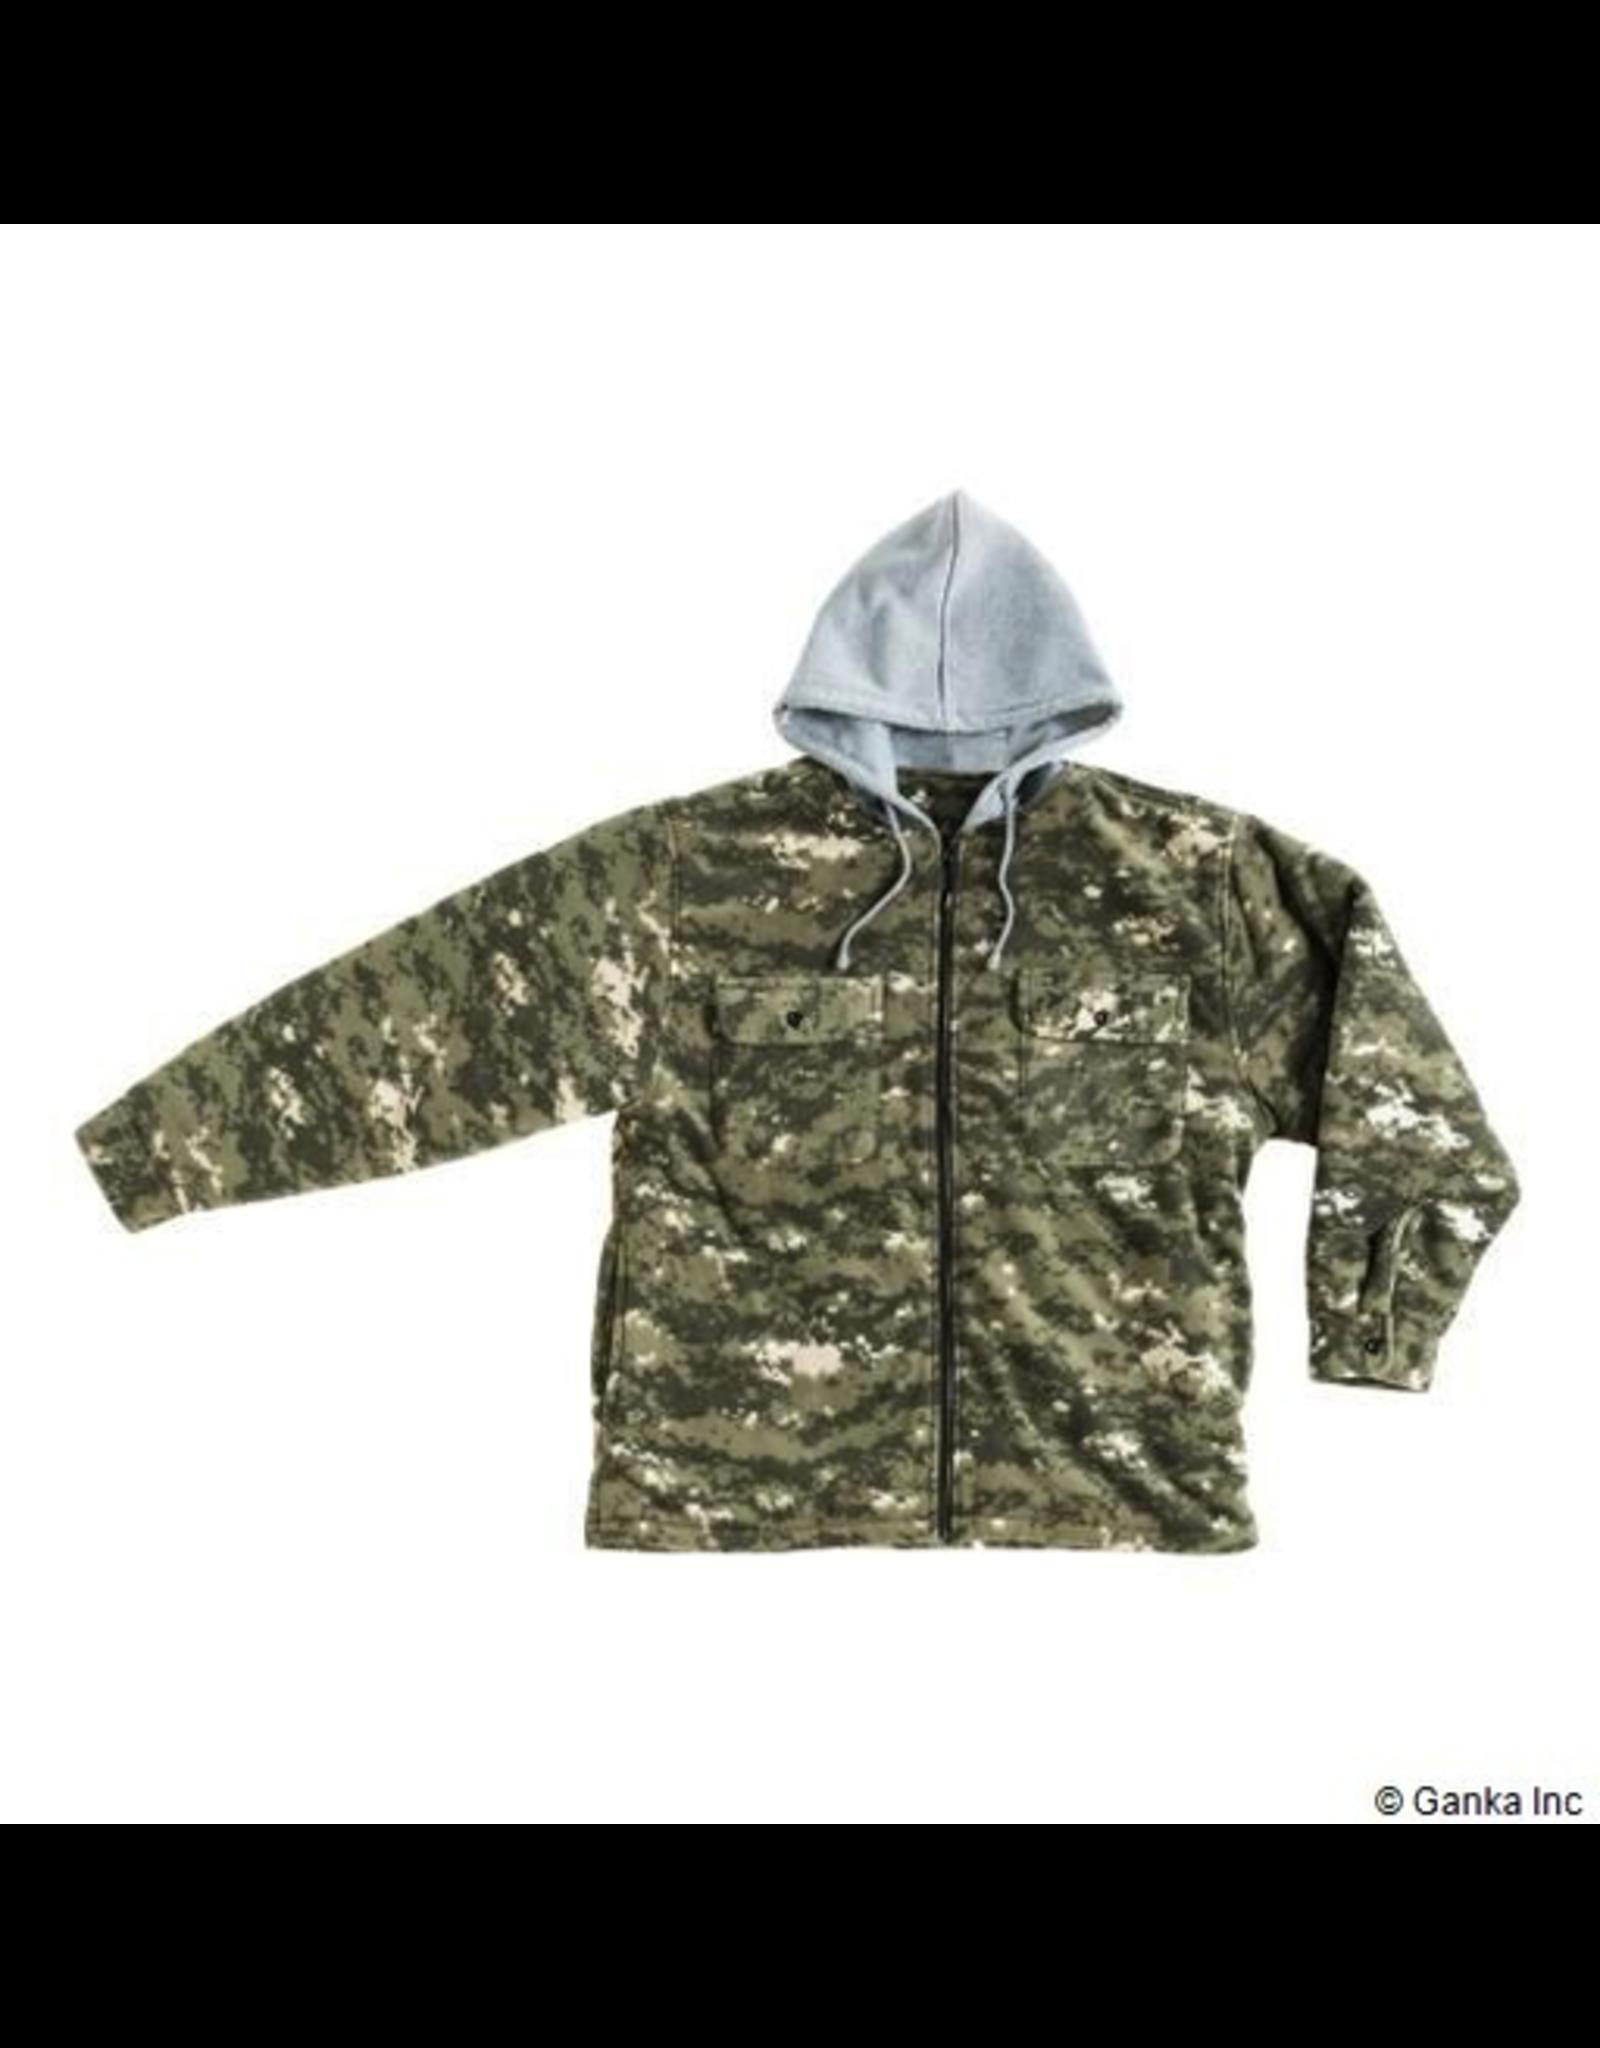 10/4 Job 10/4 Job Mens Shirt Jacket-Fleece-Hood-Sherpa